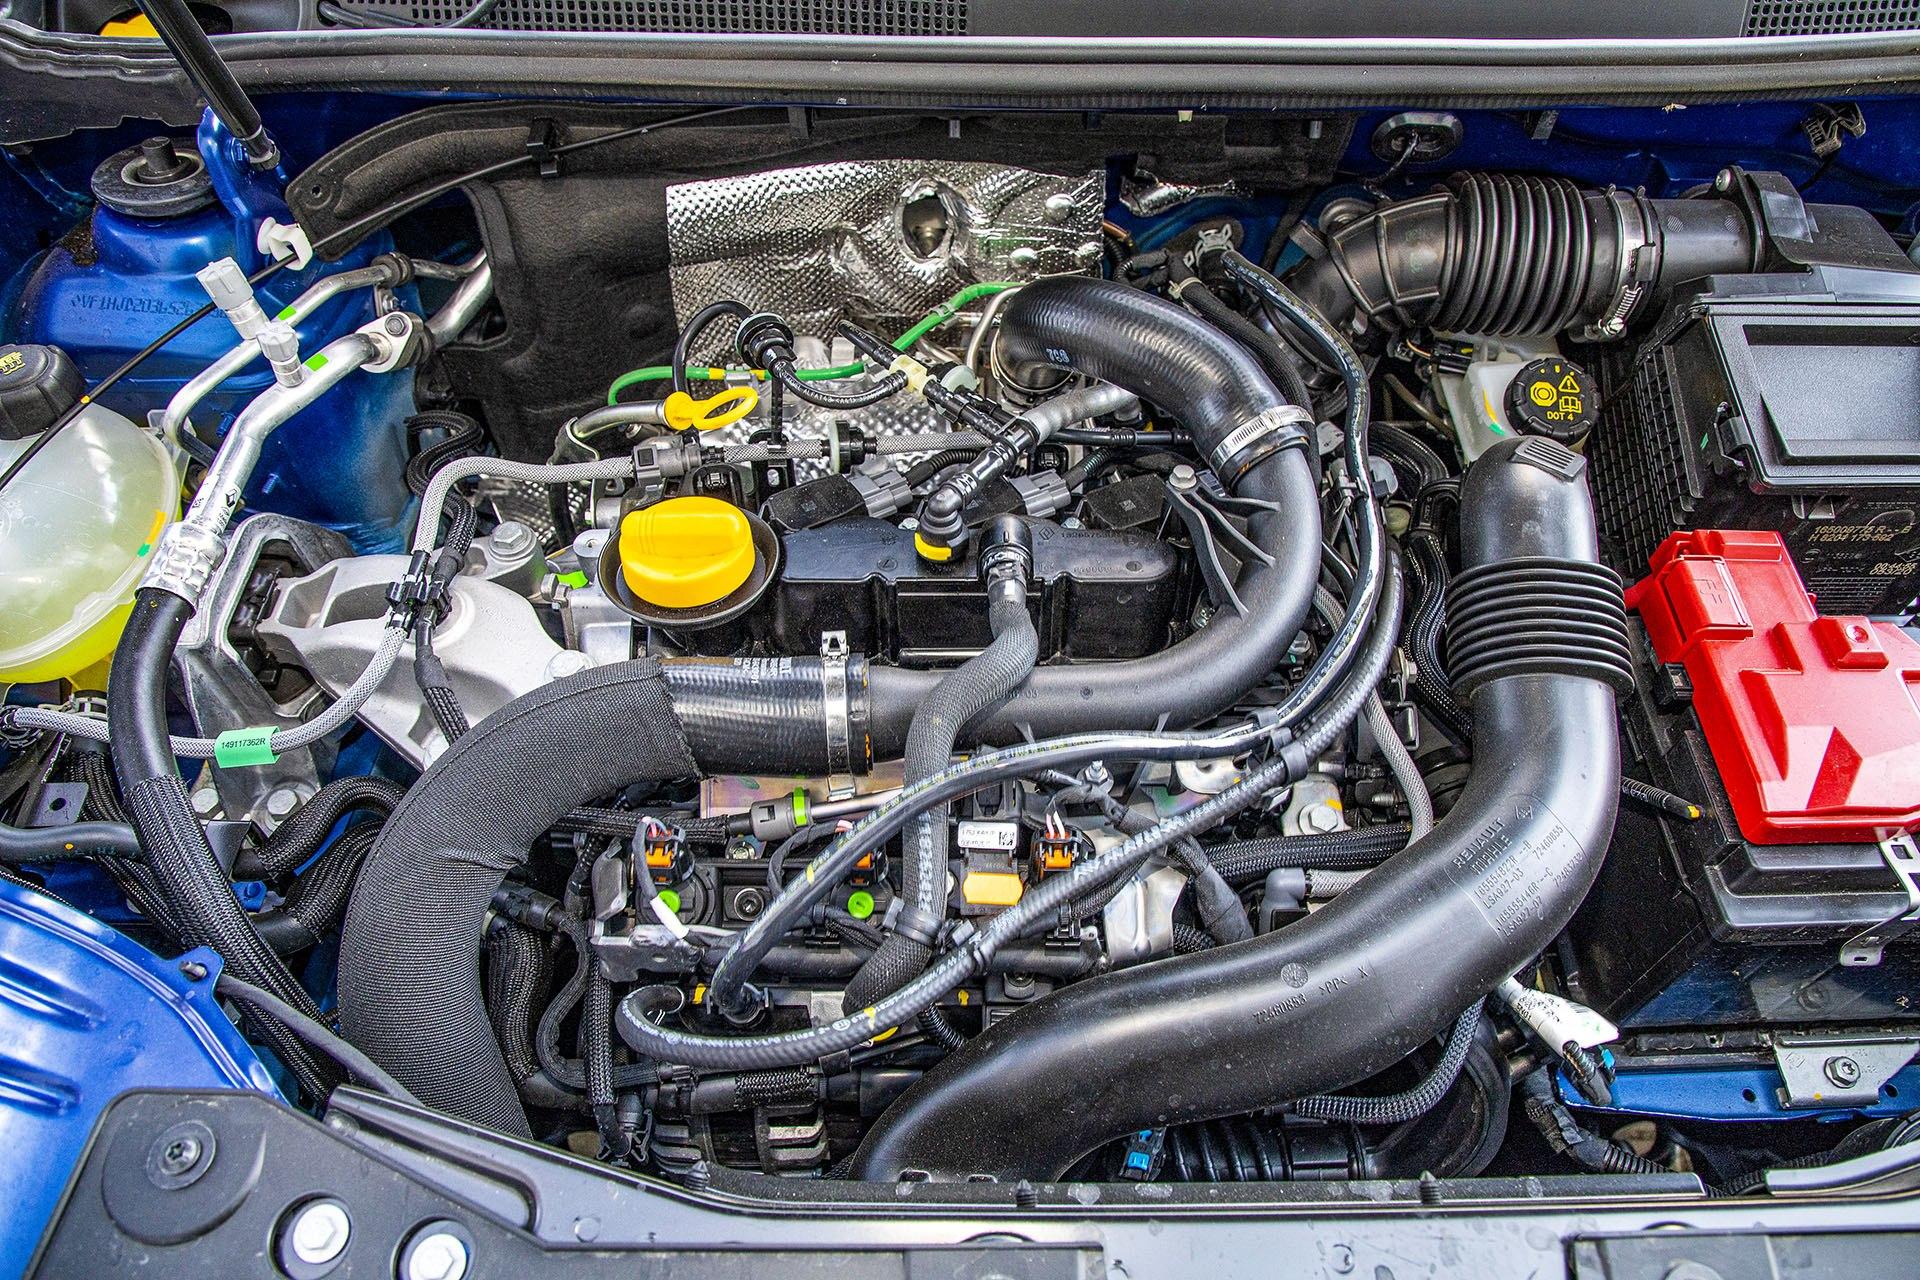 Dacia Duster 1.0 TCE 100 LPG test – silnik